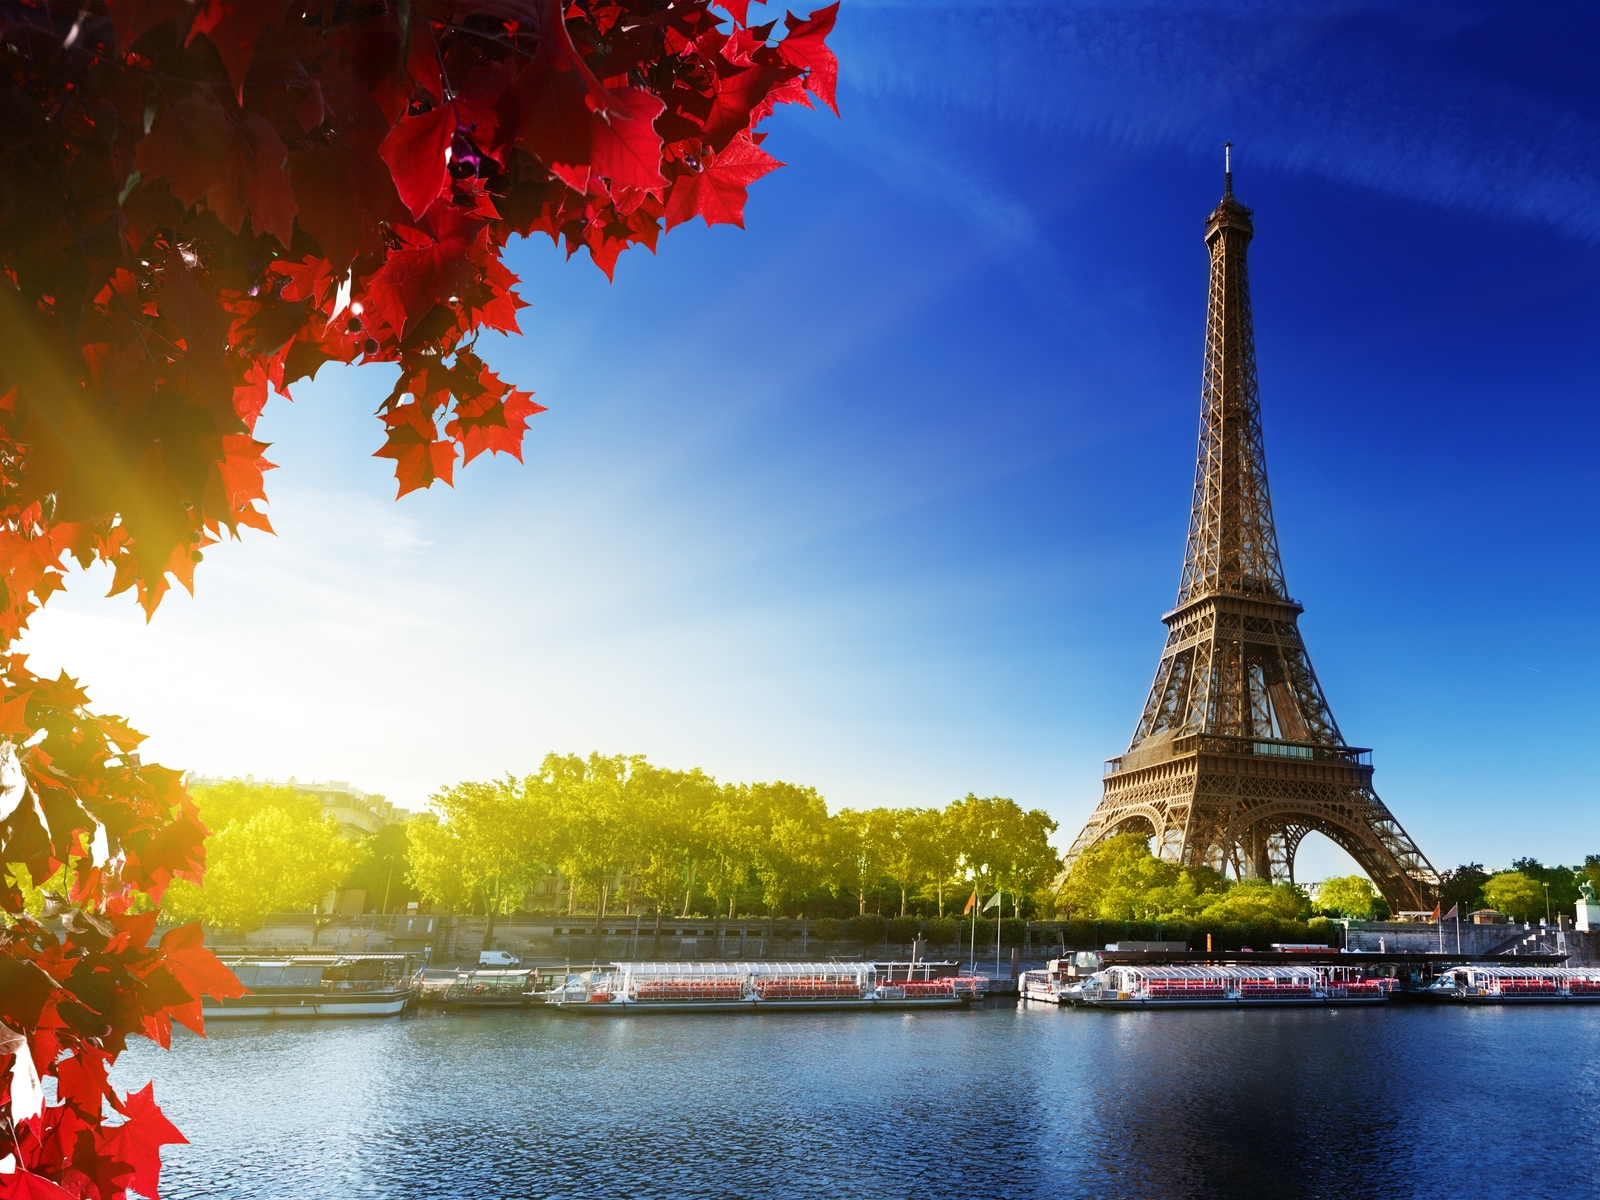 Fondos de pantalla gratis paris francia